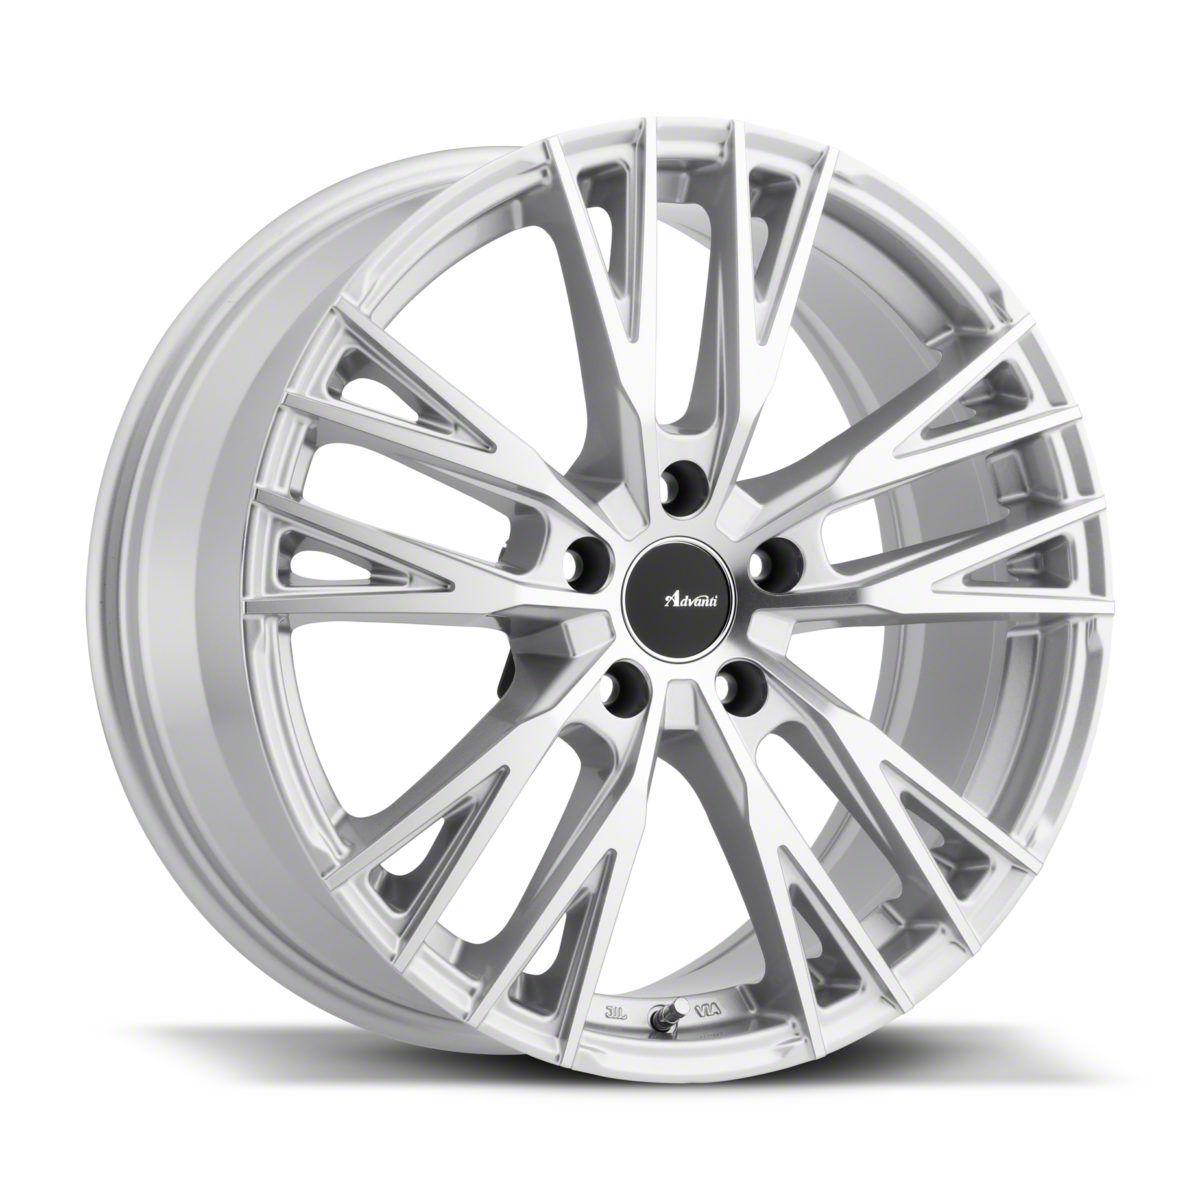 Advanti Forchette Silver w/ Machined Face Wheel - 19x8.5 (05-14 Standard GT, V6)